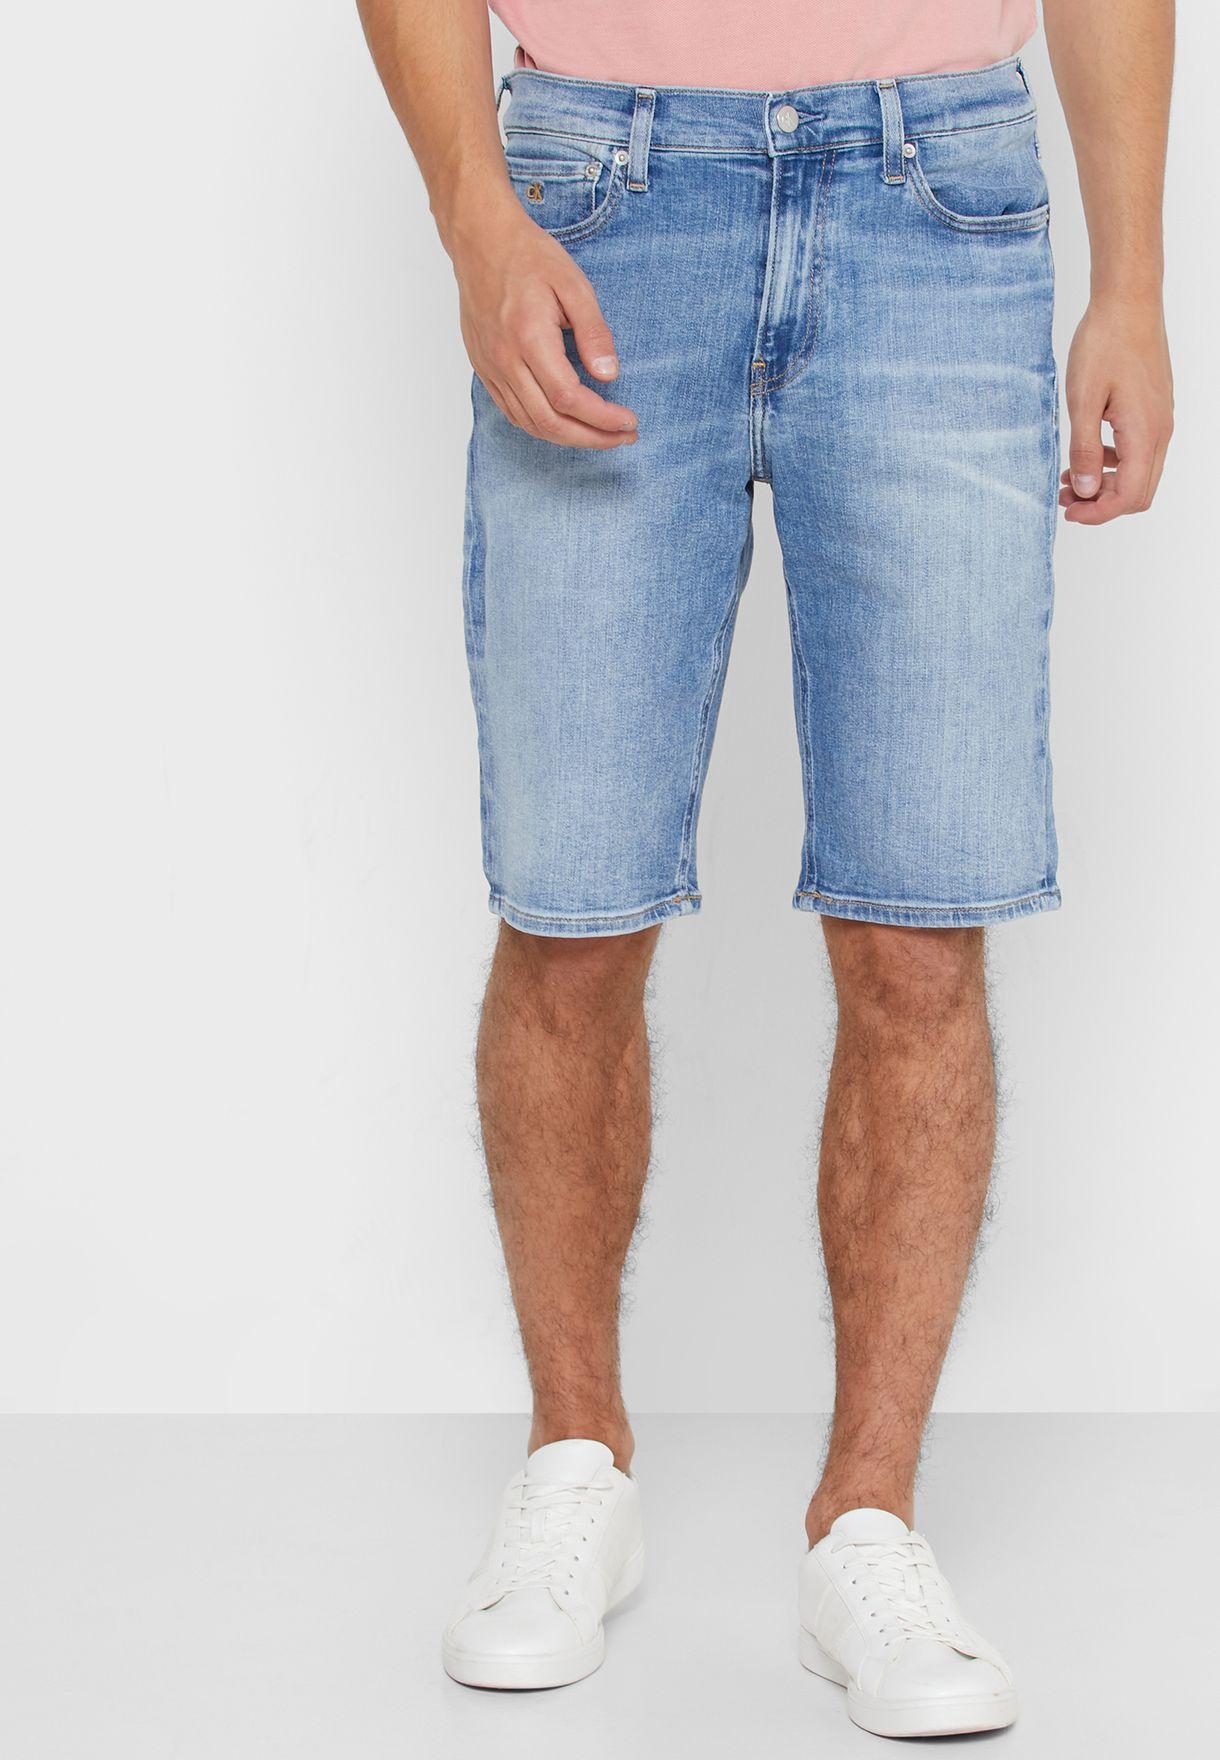 Light Wash Slim Fit Denim Shorts